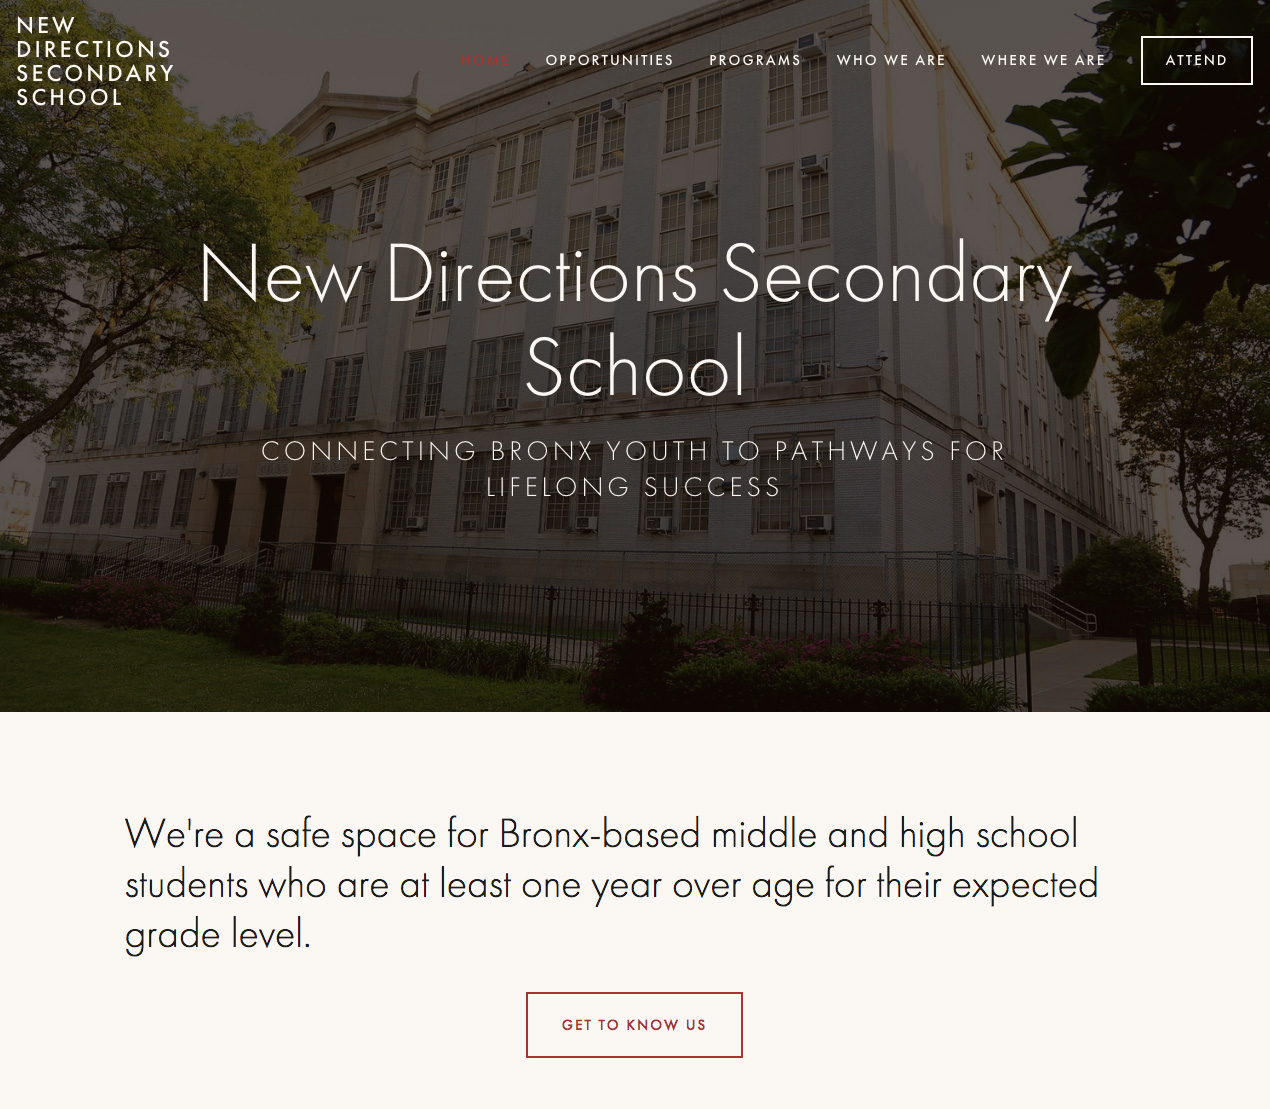 NewDirectionsSecondarySchool_4.jpg